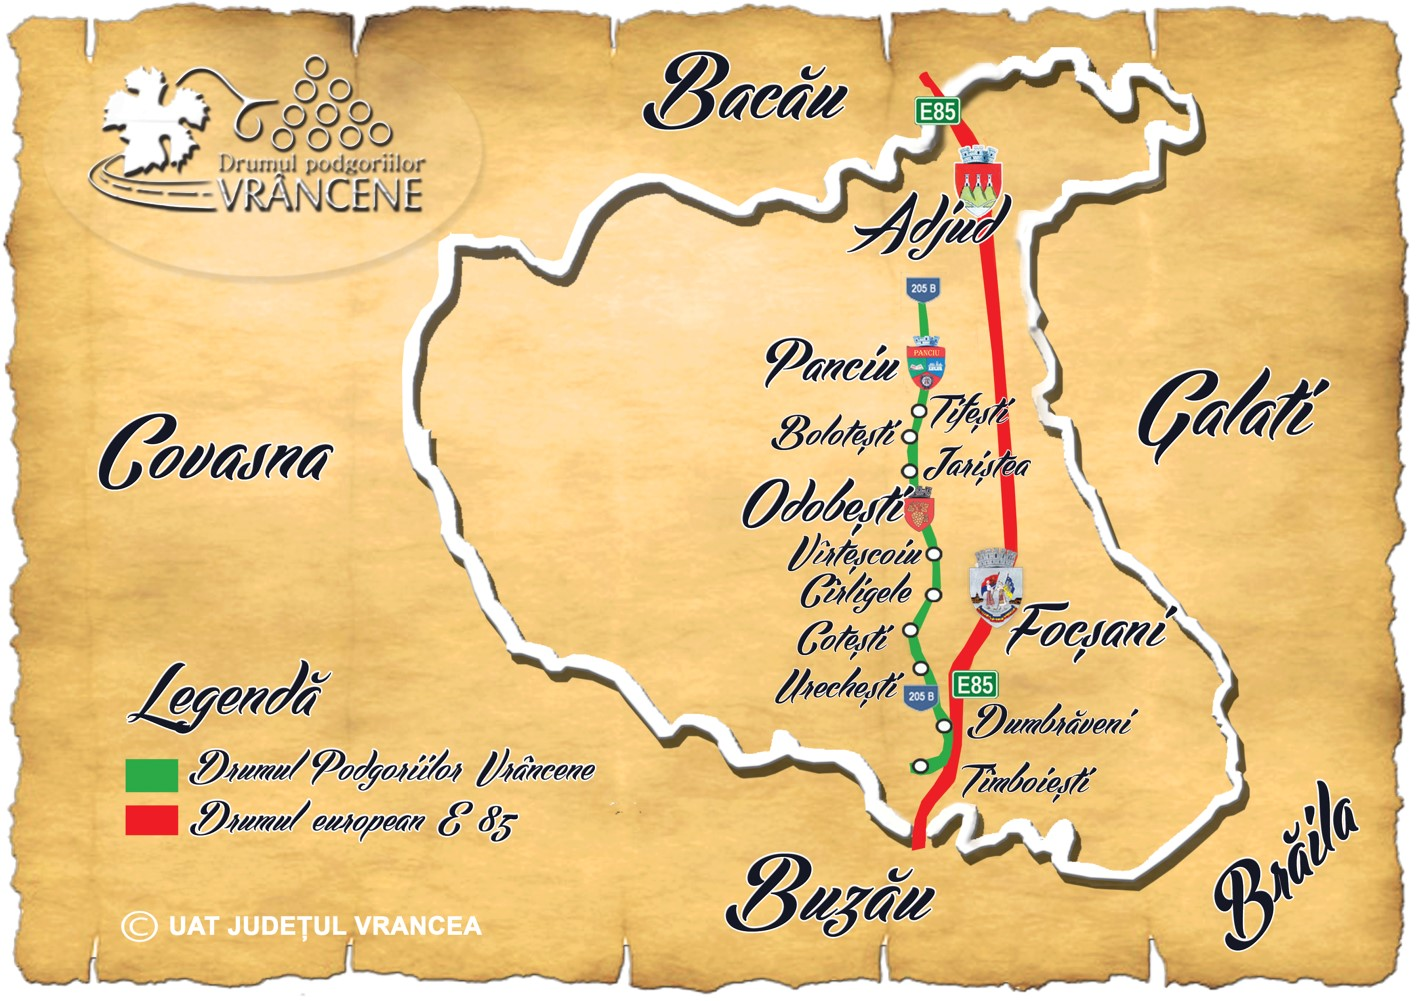 Drumul Vinului Vrancea Turism Istoric